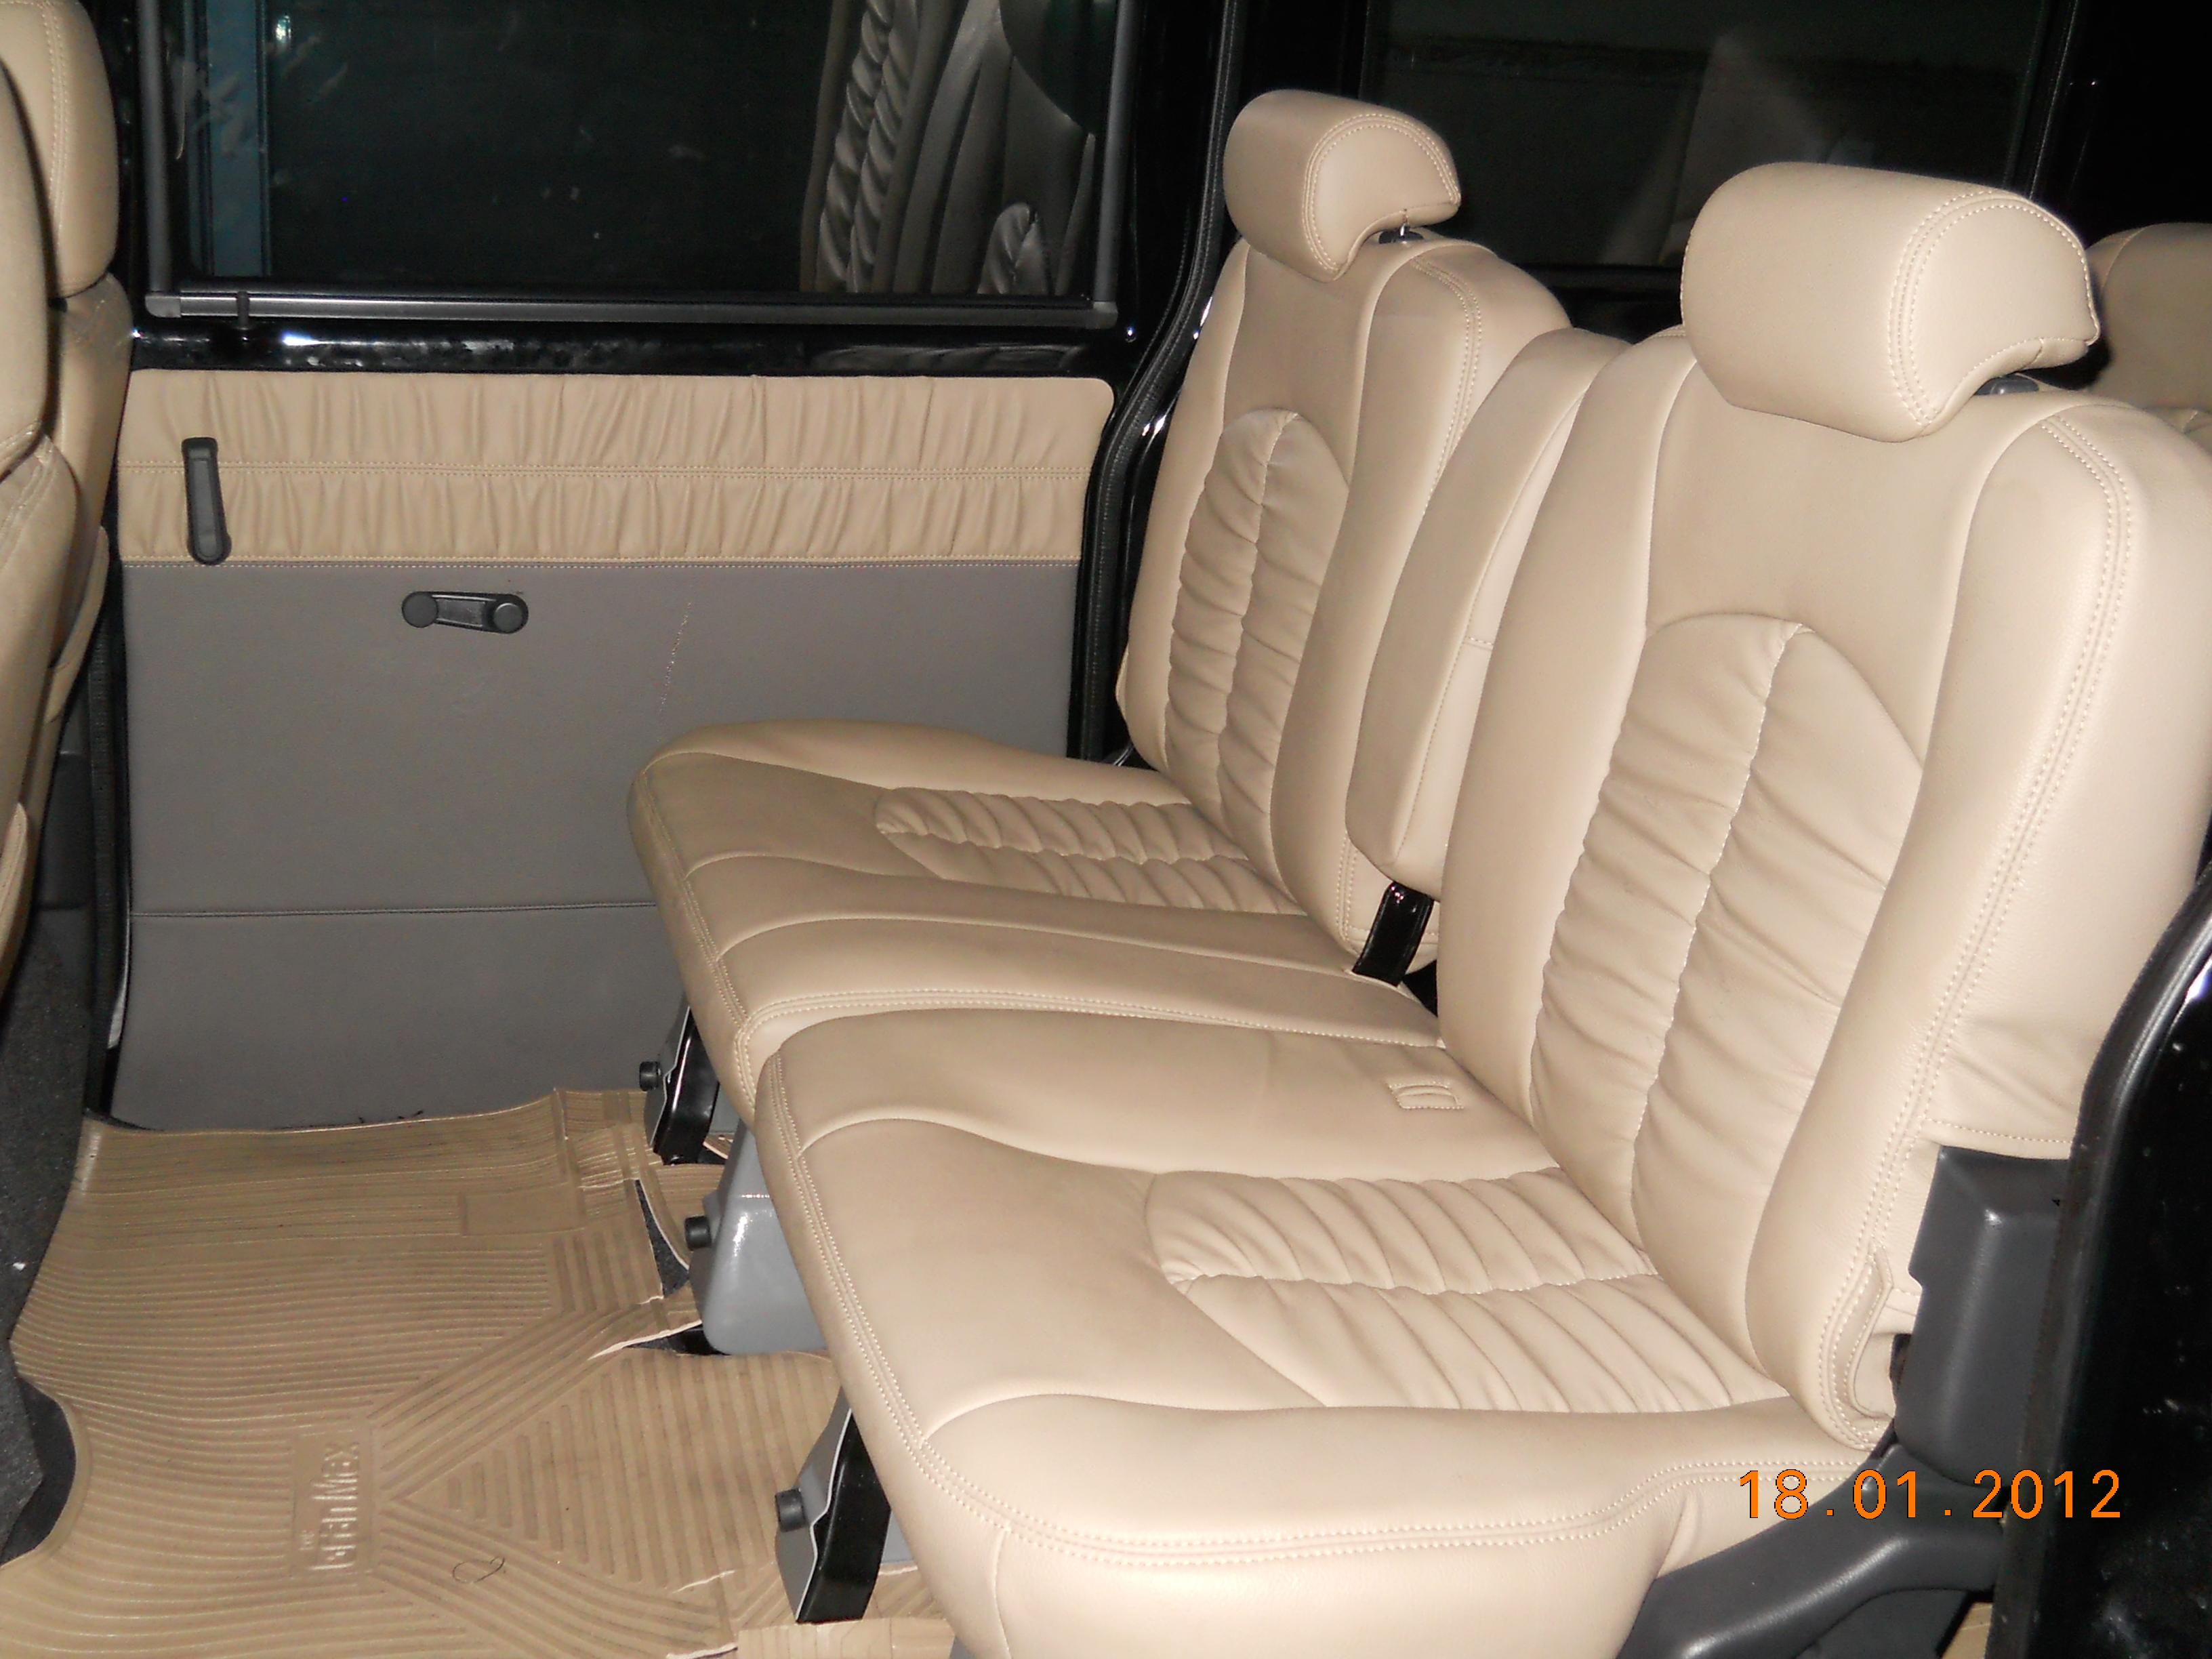 cover jok grand new avanza fitur veloz 1.3 daihatsu grandmax specialist mobil surabaya elegant model kerut dscn1718